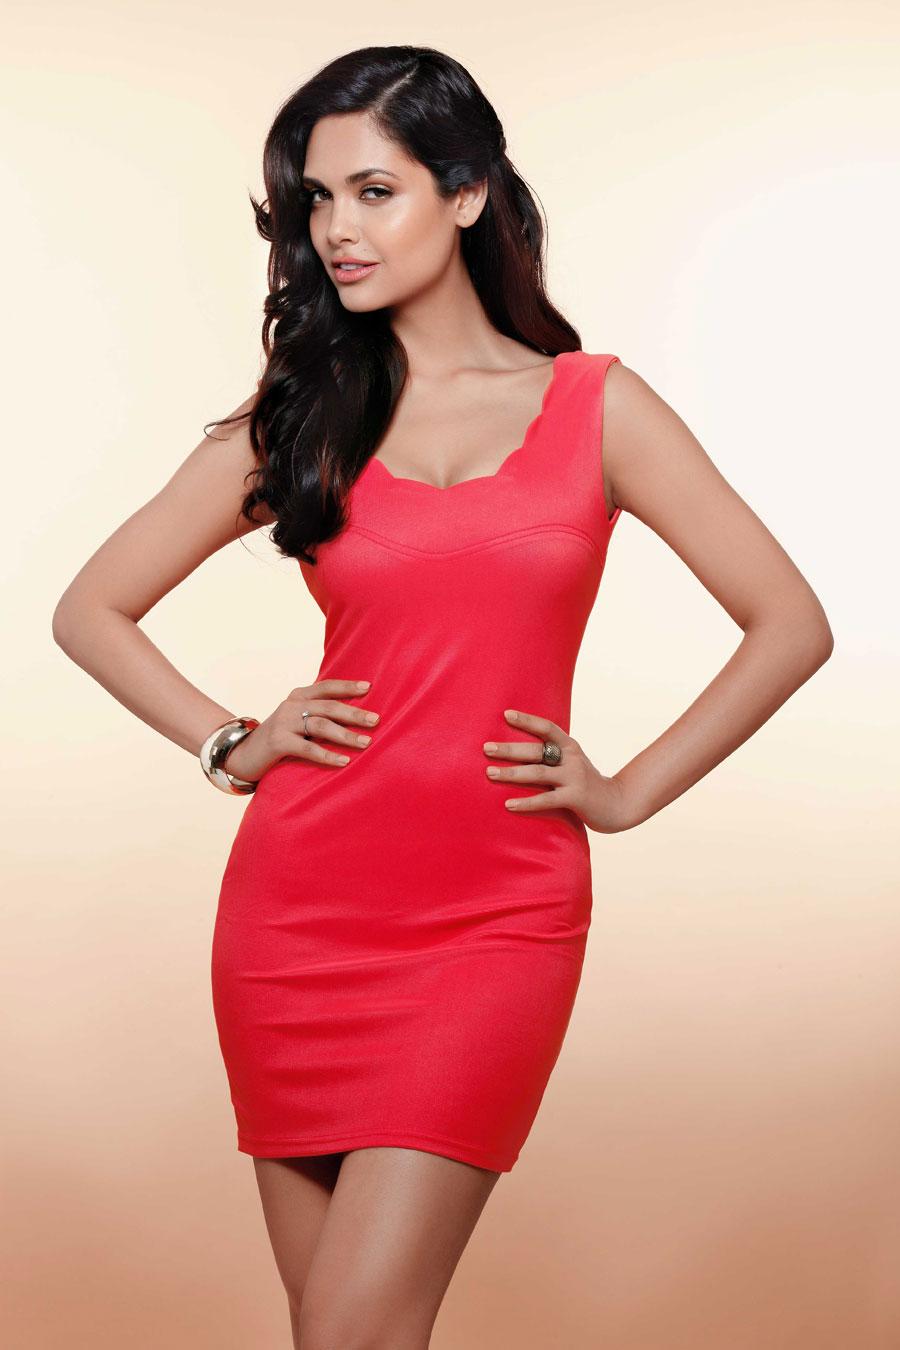 Ileana D Cruz Hd Wallpaper Esha Gupta Lovely Dress Wallpapers Popopics Com